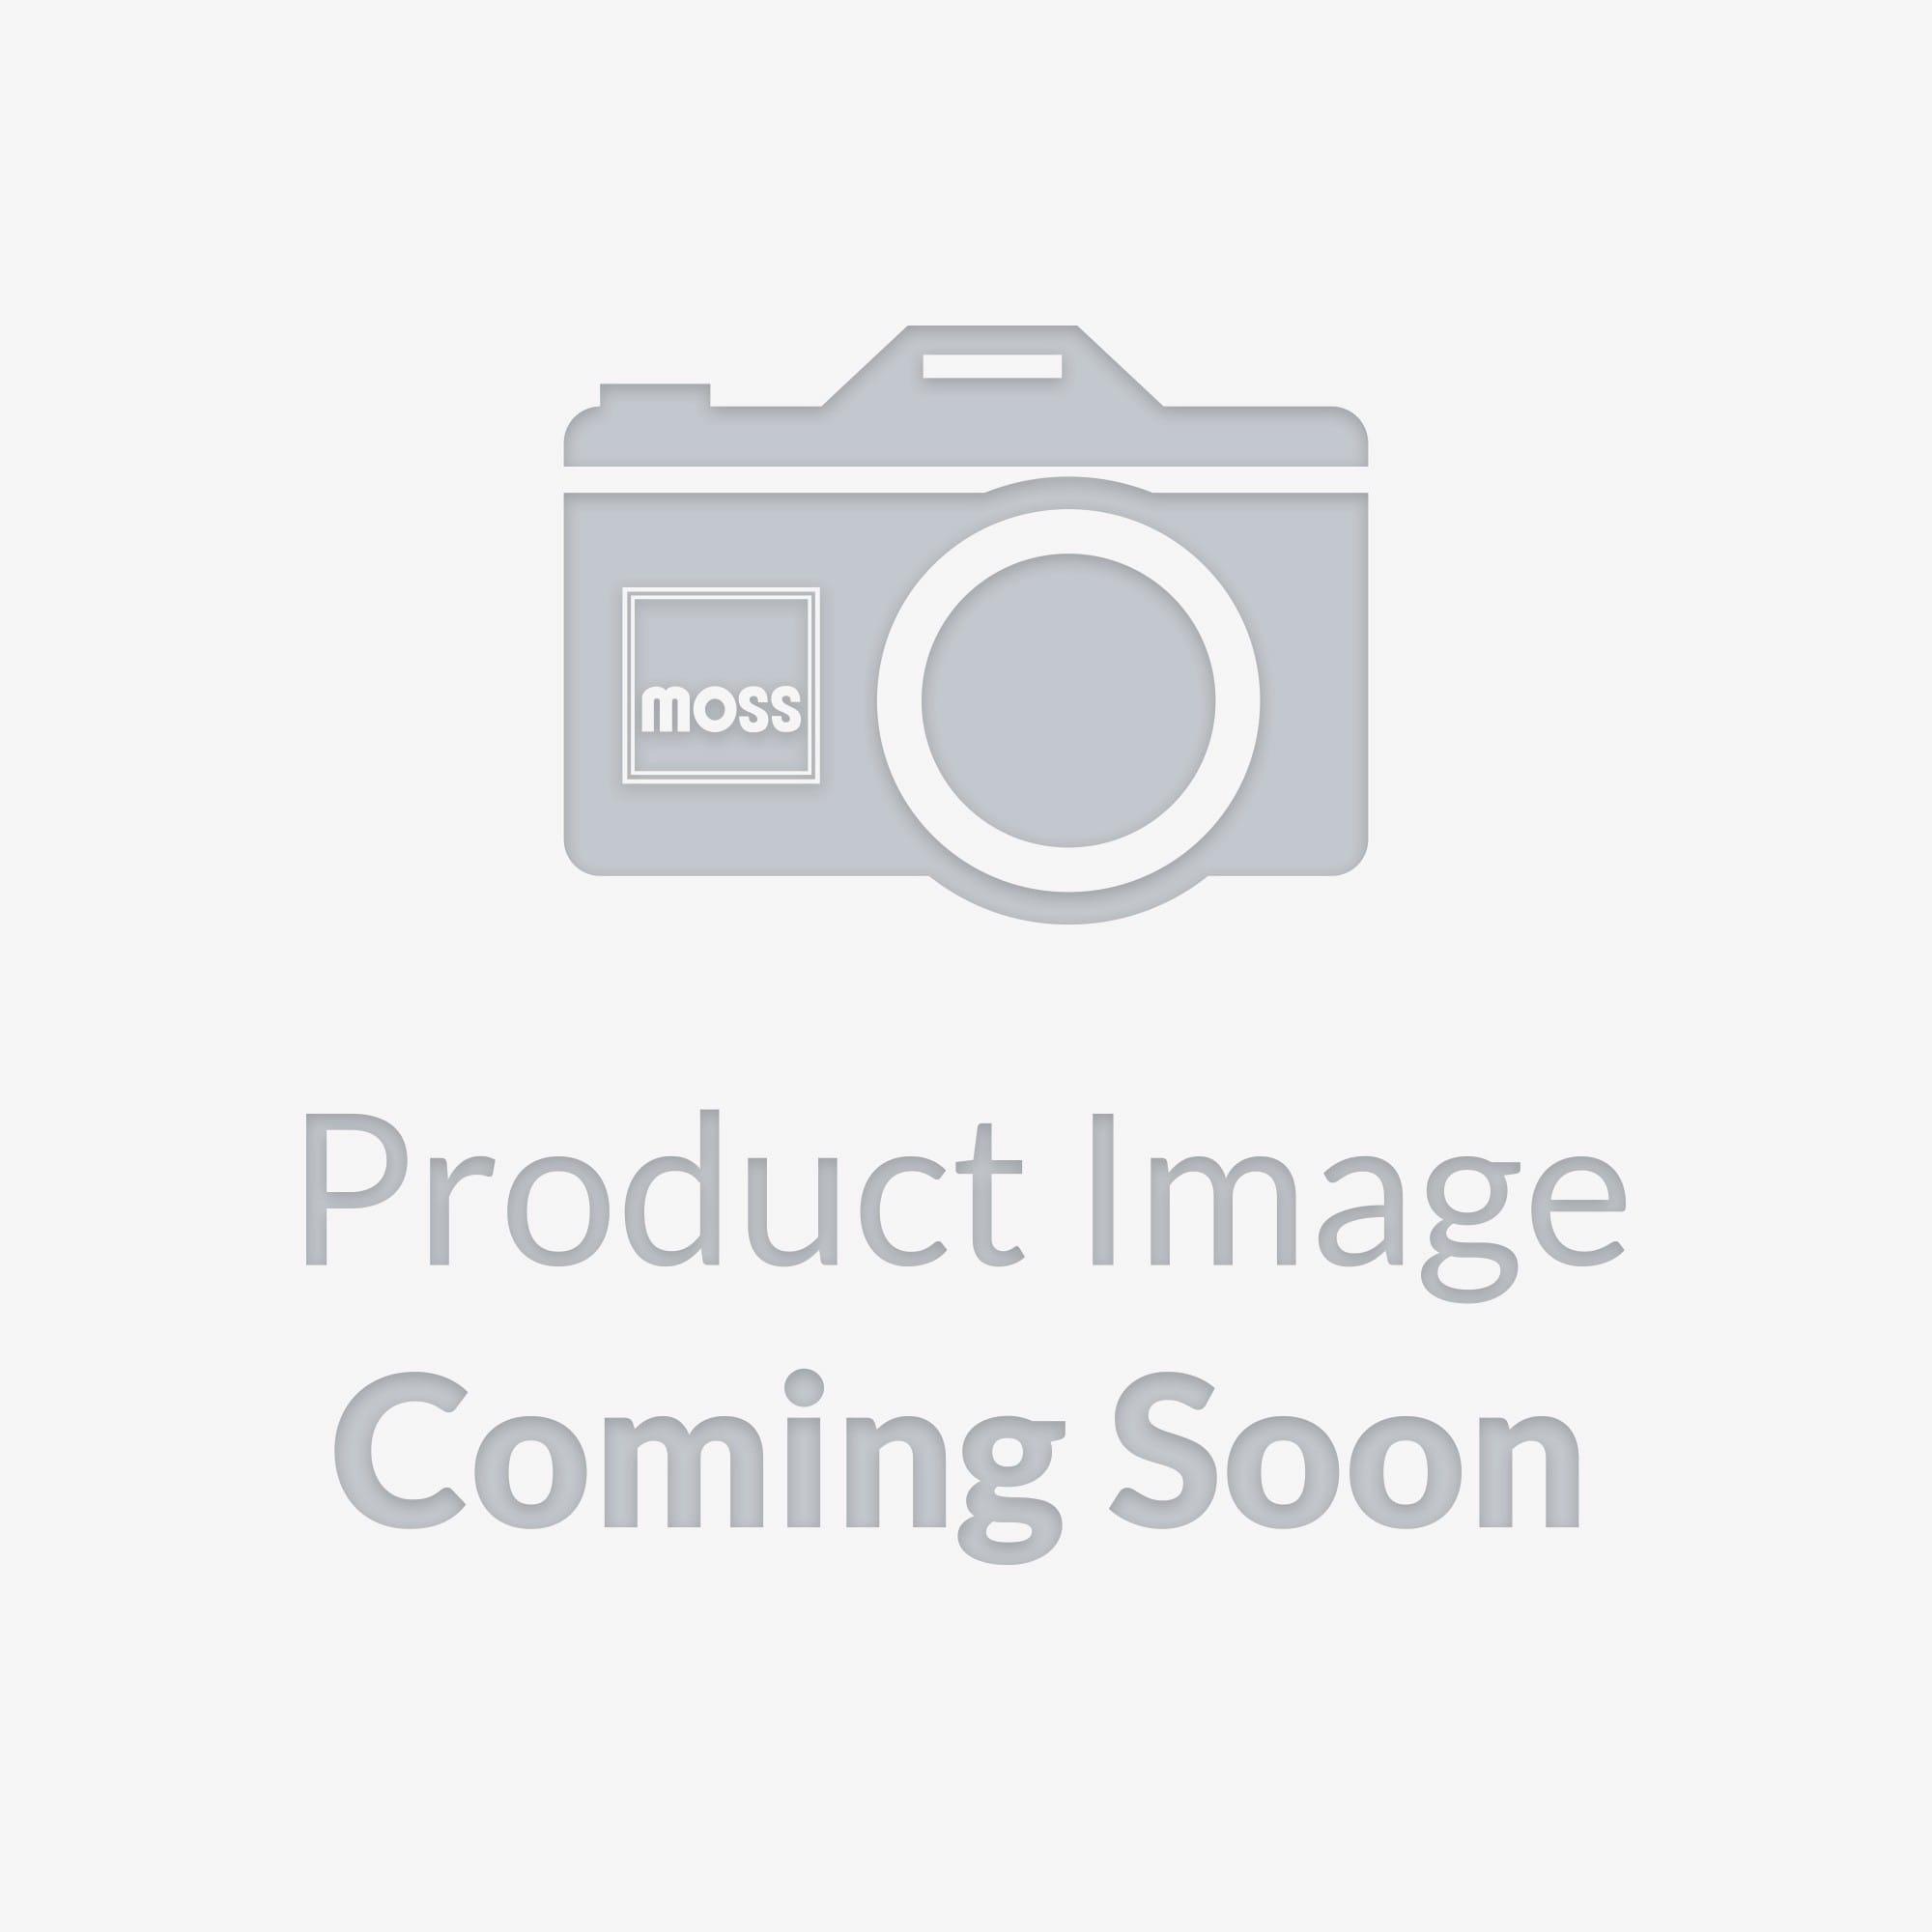 Fits Mazda Miata 1990-2005 Oil Pan Drain Plug; Engine Oil Drain Plug Plugs